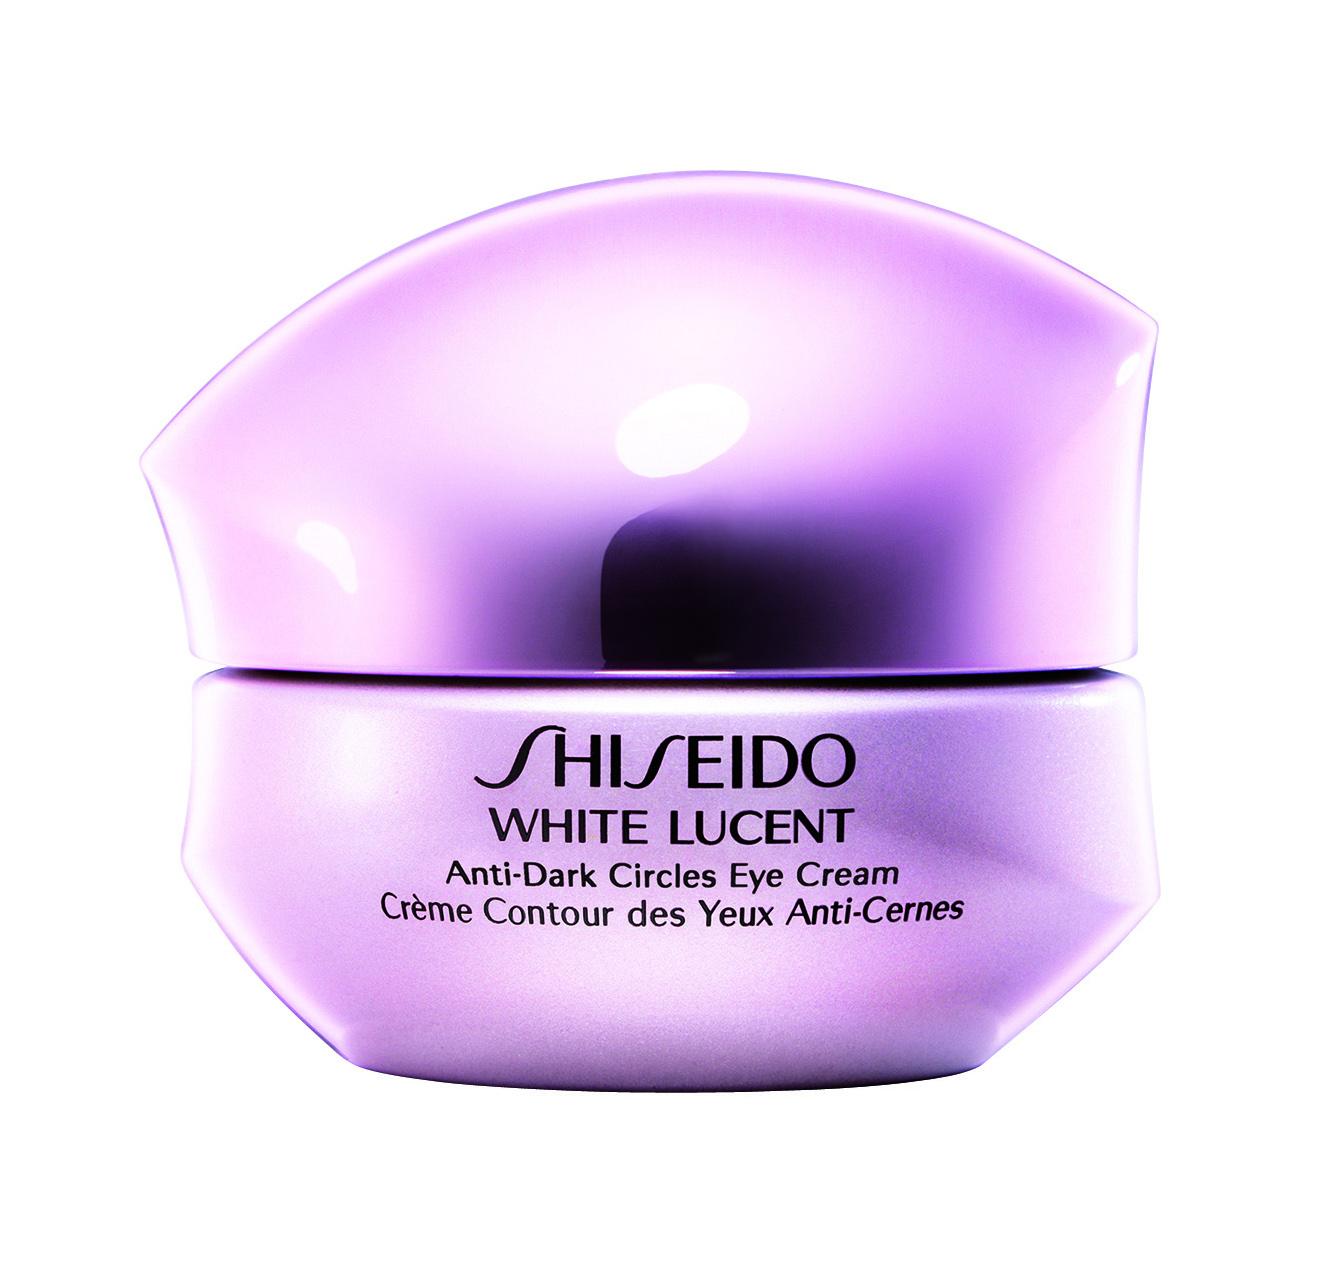 Shiseido white lucent anti dark circles eye cream 0 5 moisturizer beauty.